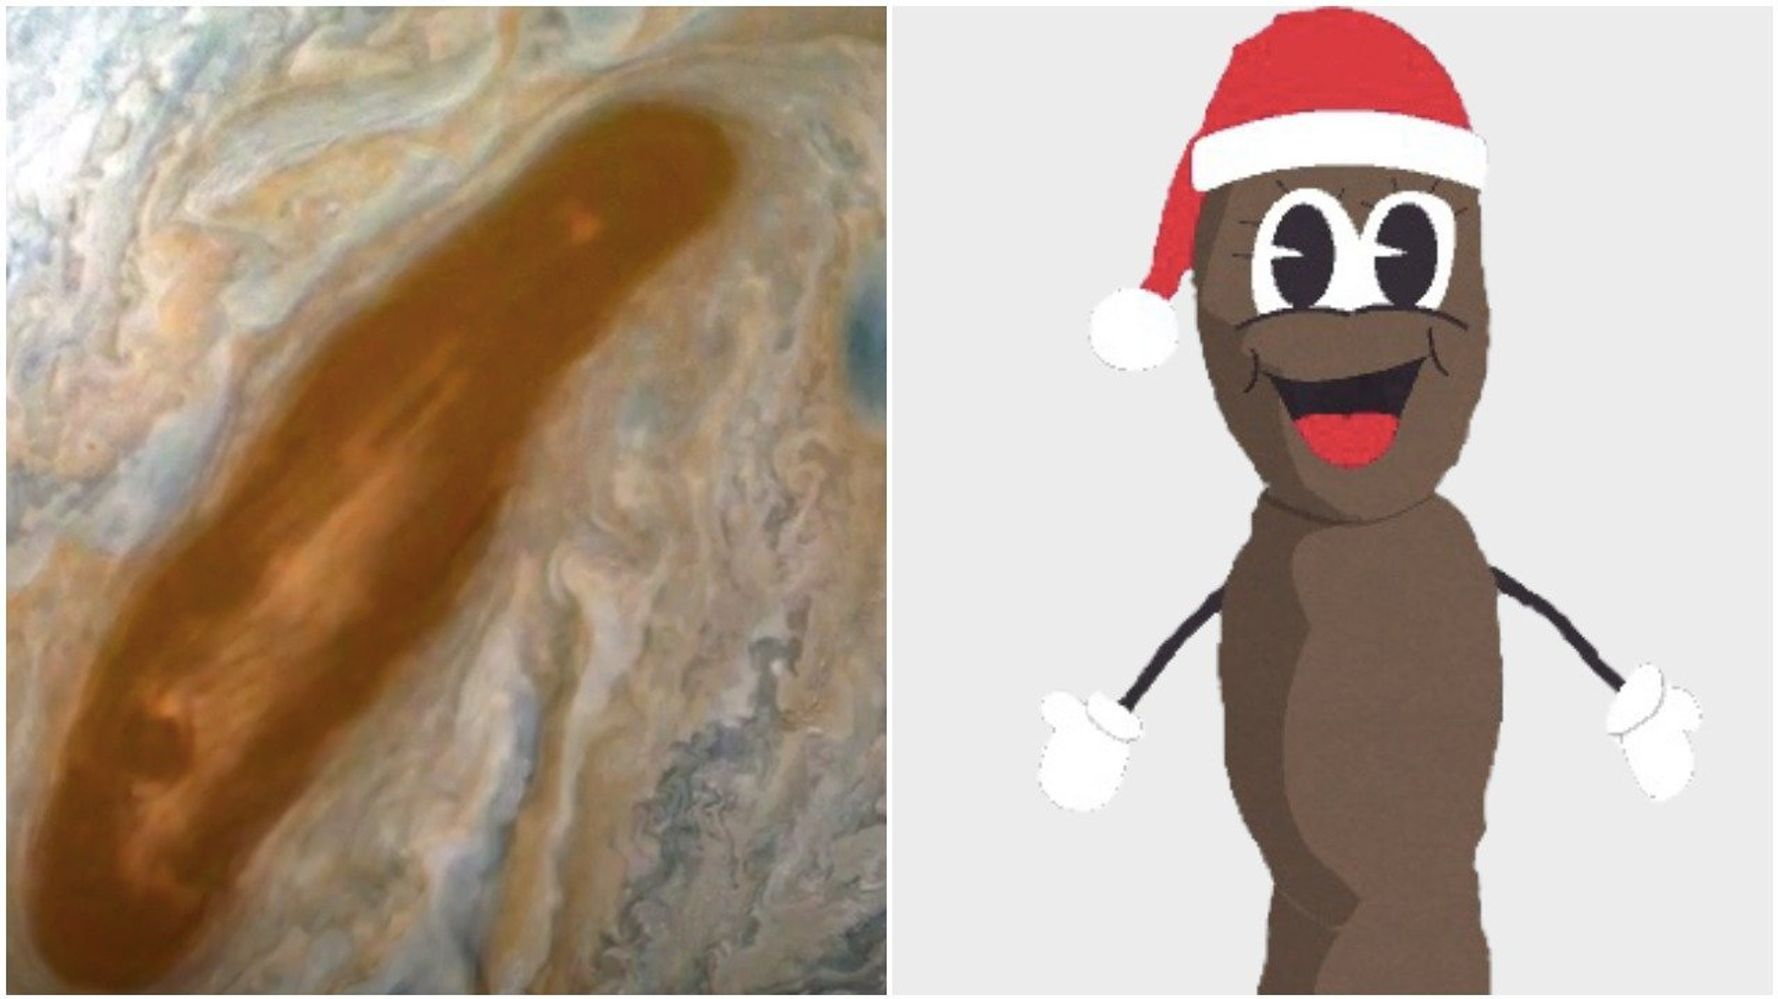 Hankey The Christmas Poo.Nasa Discovers South Park Character Mr Hankey The